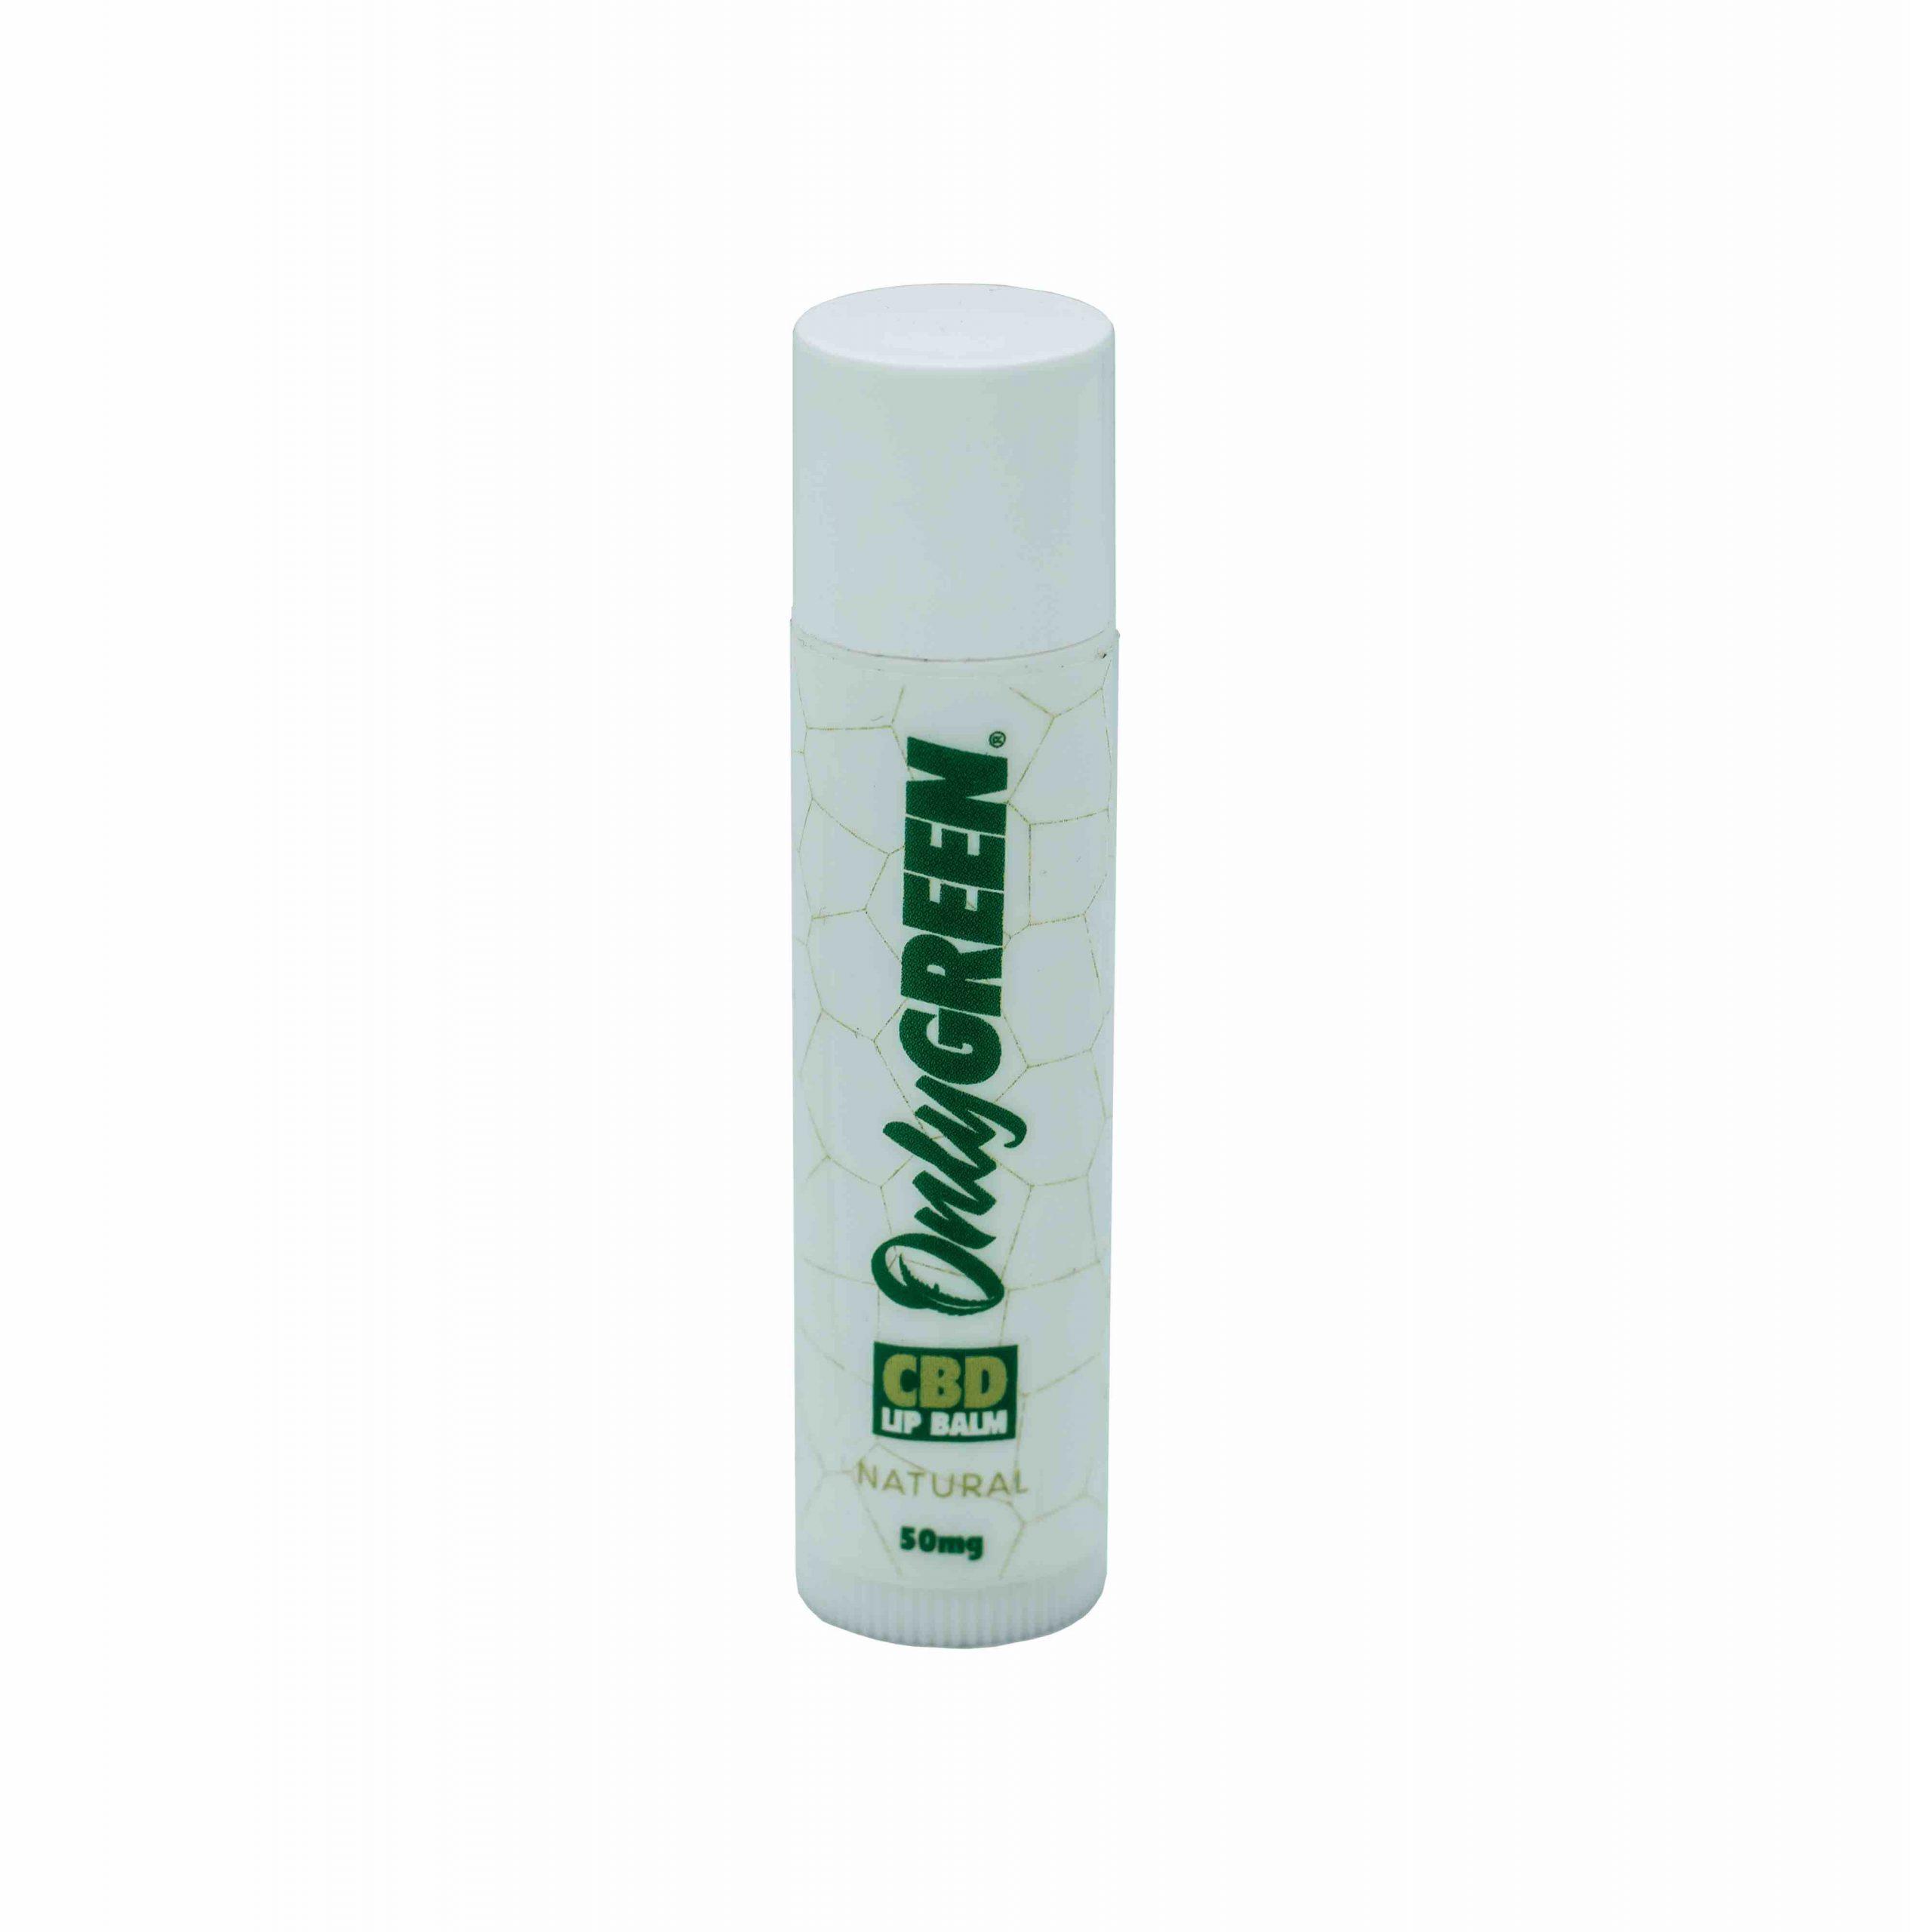 Tube of Only Green CBD Lip Balm